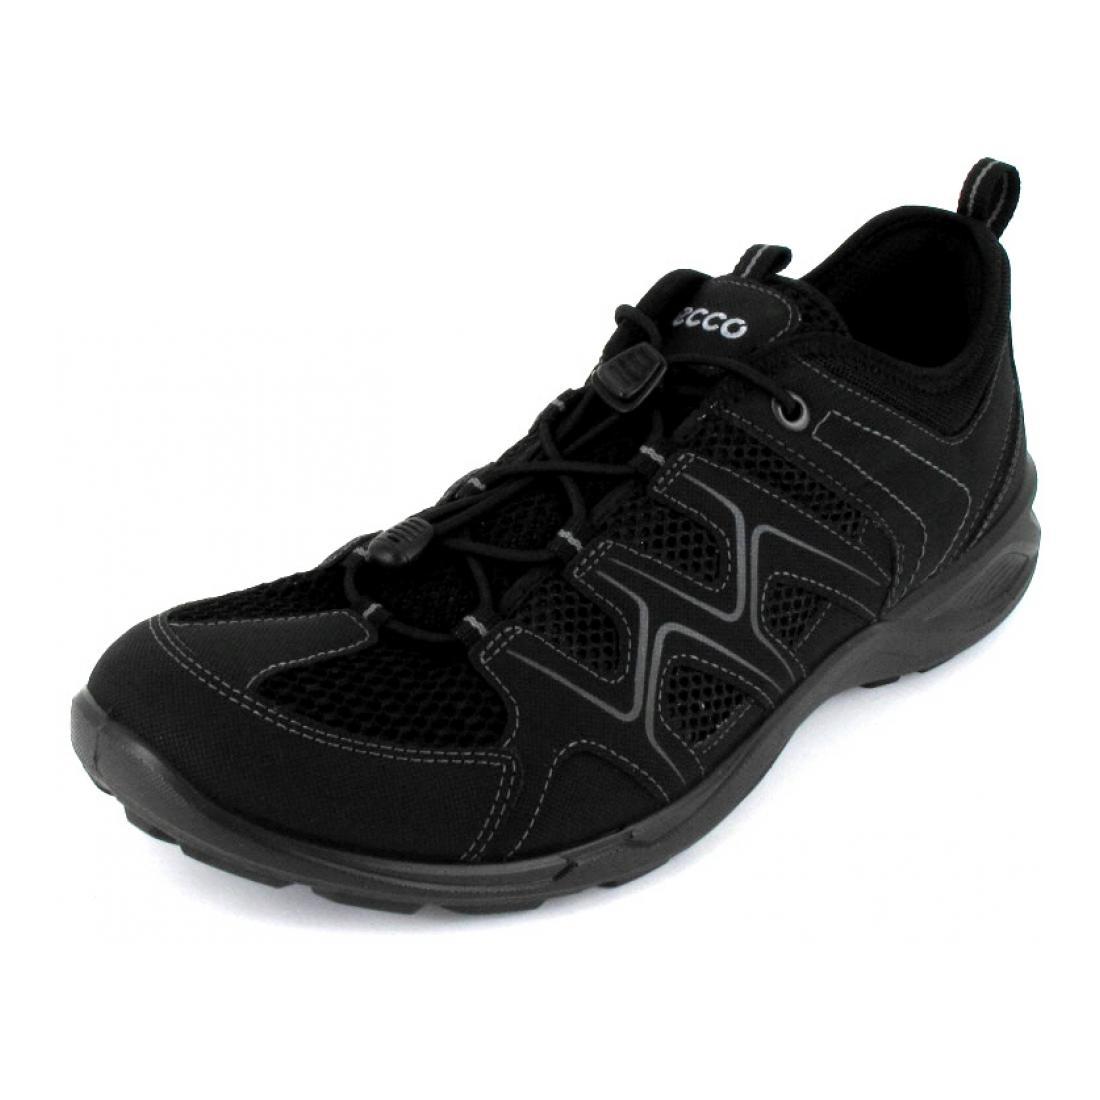 Ecco Sneaker Terracruise LT M Black